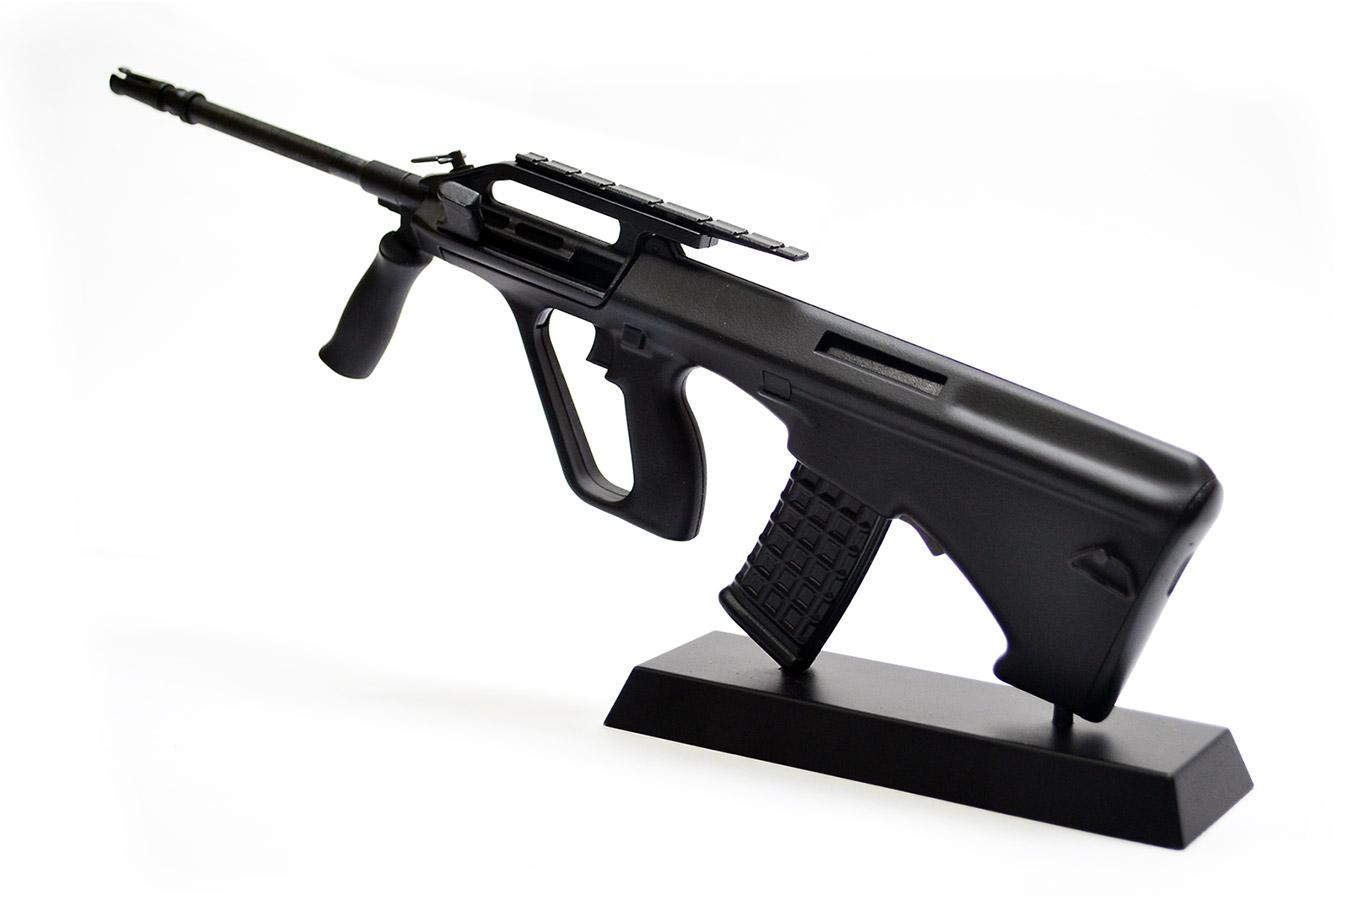 Макет армейской винтовки Steyr AUG в масштабе 1:4 черная